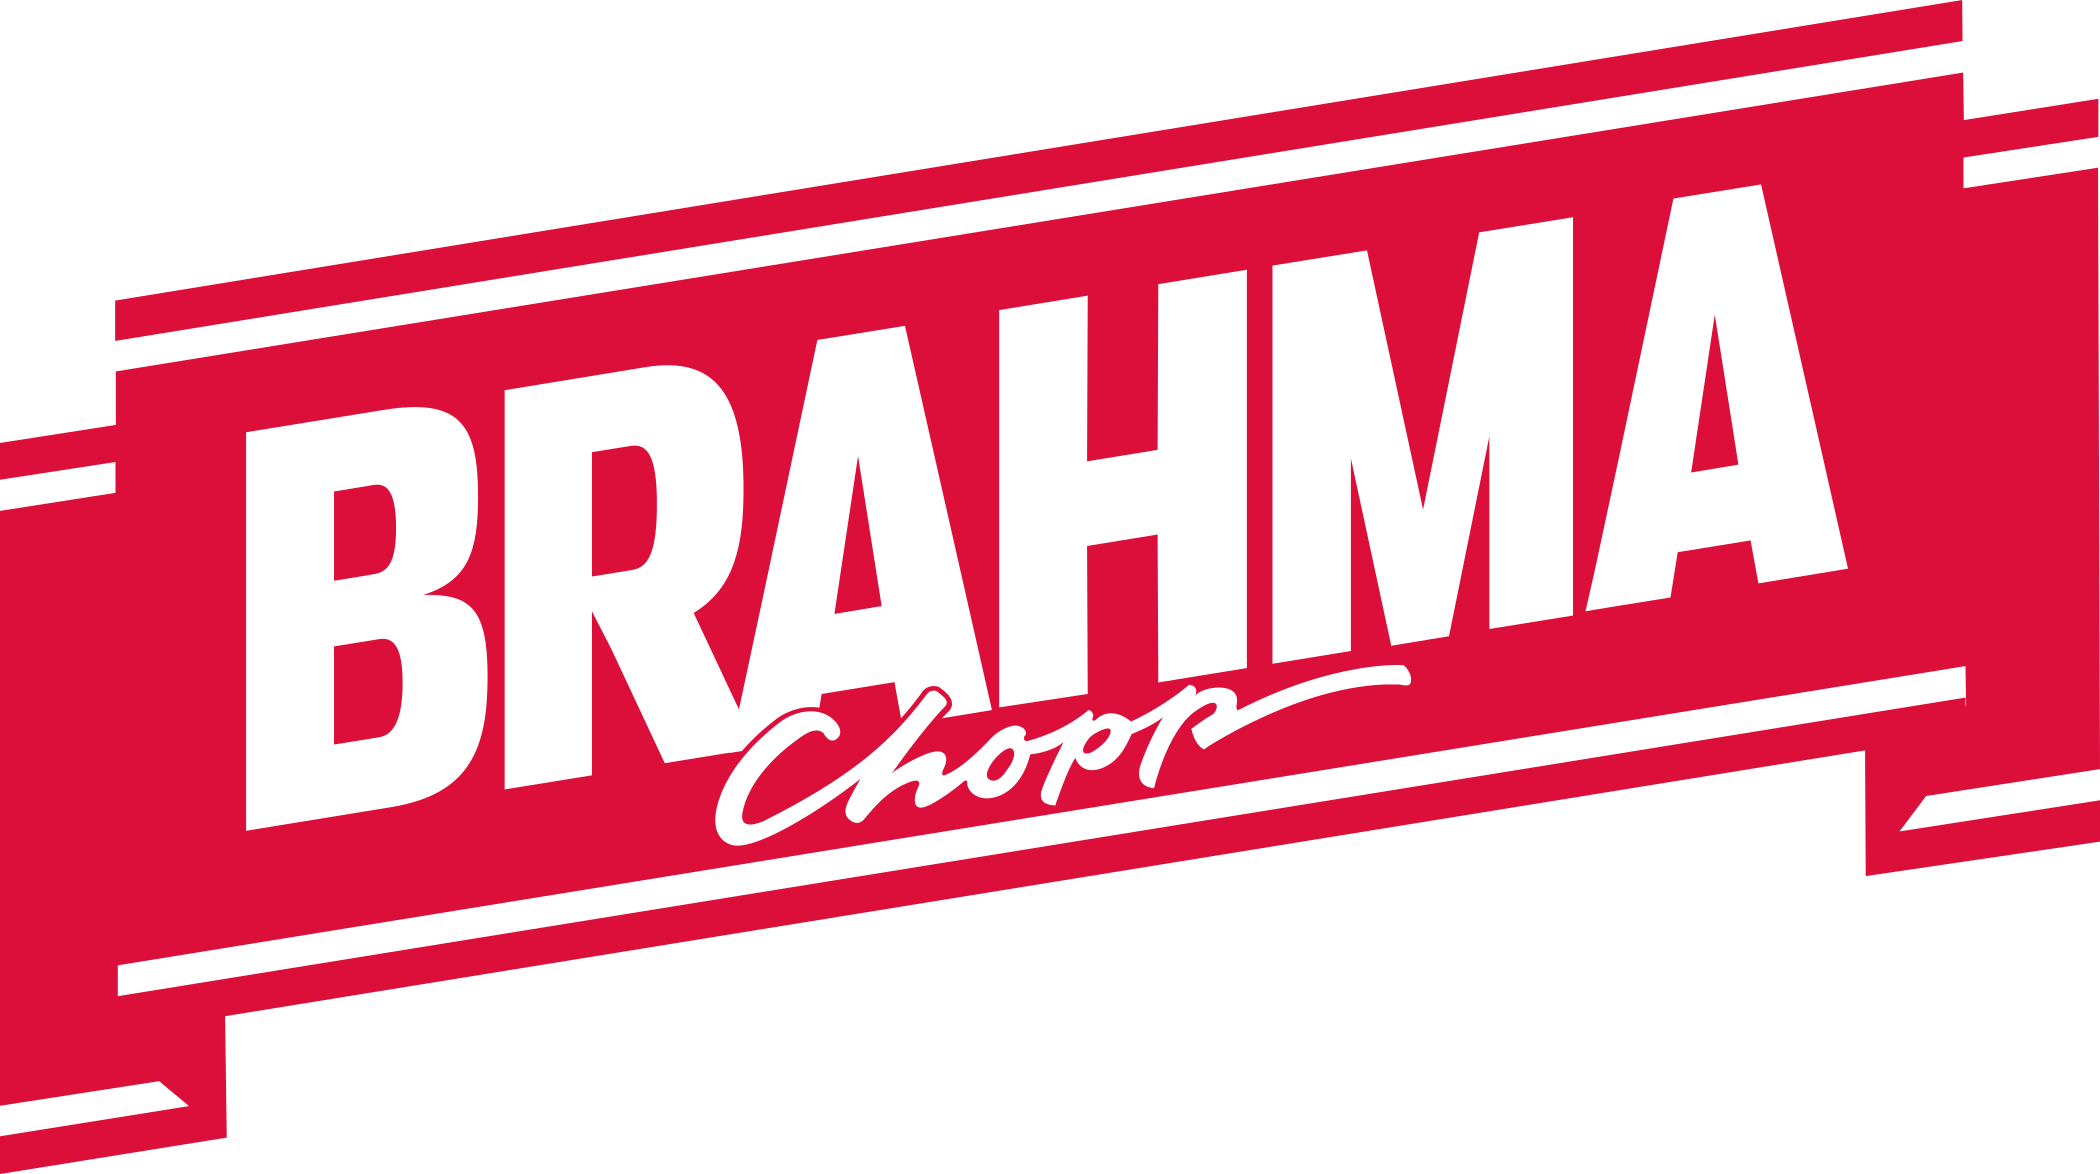 brahma-logo-1